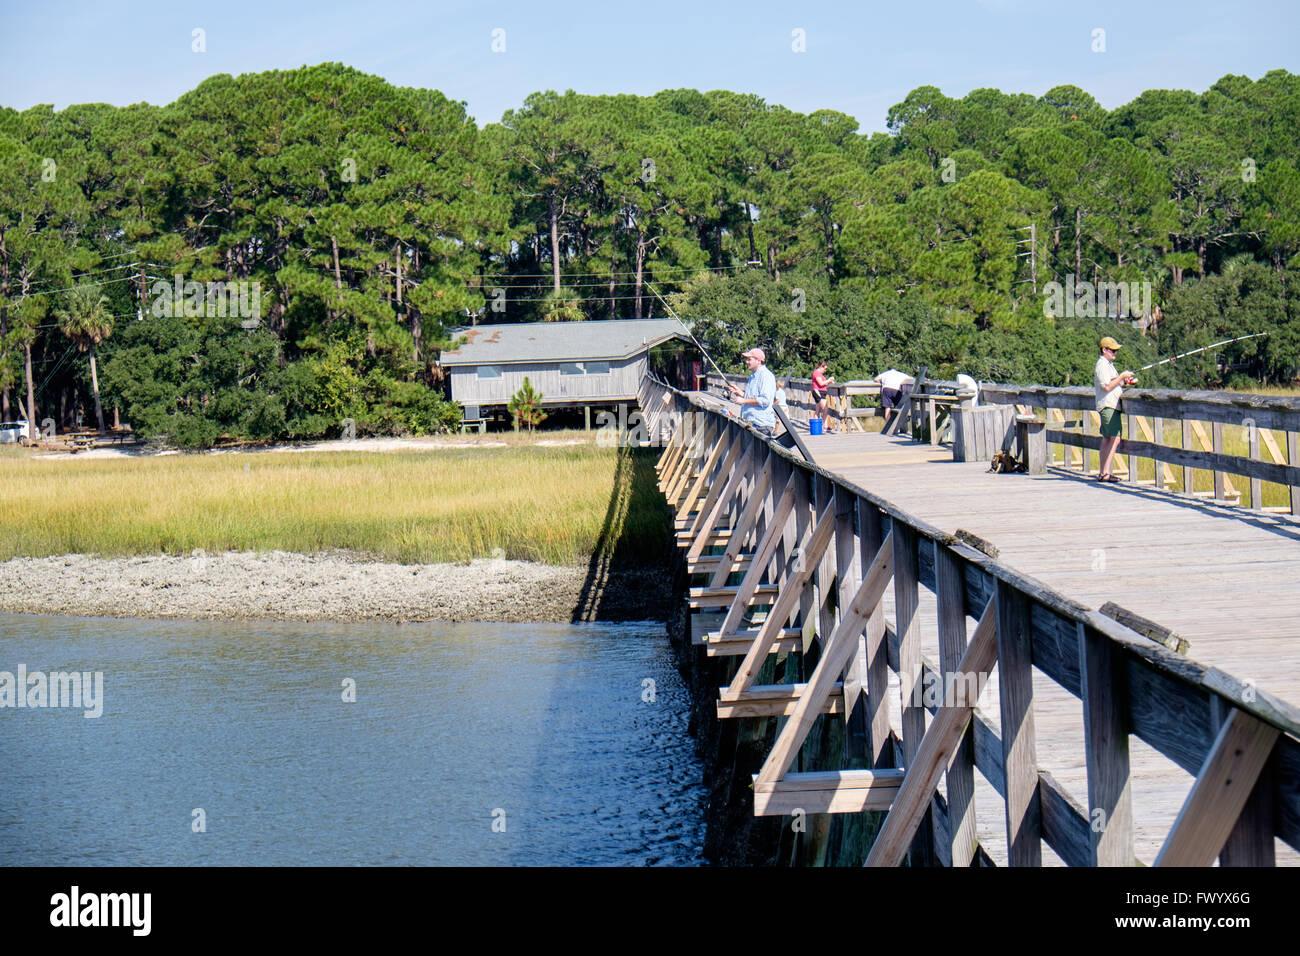 Pêche à la jetée de Fripp inlet sur la chasse Island State Park, South Carolina, USA Photo Stock